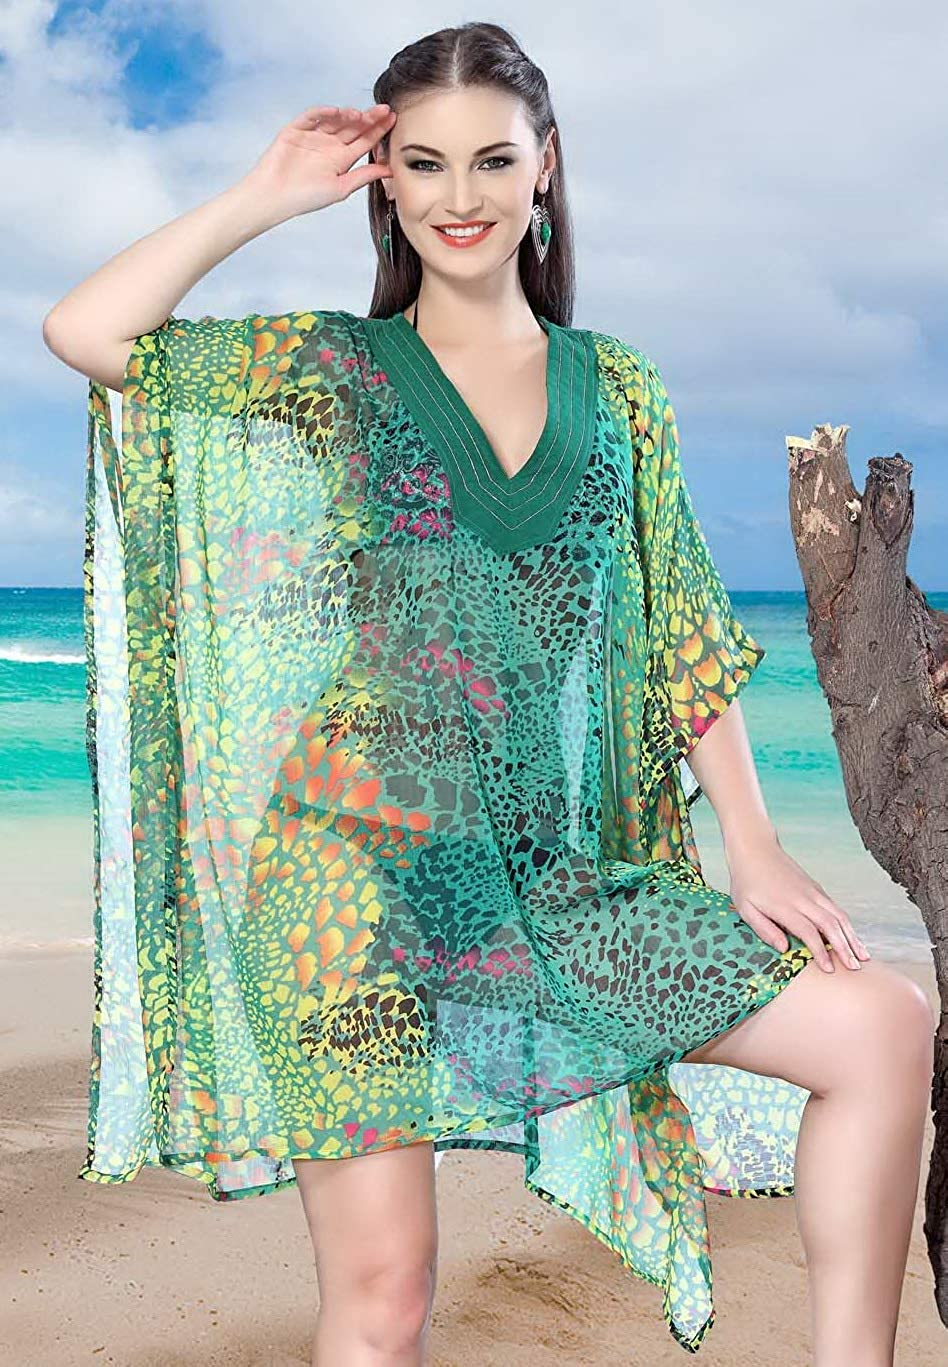 LA LEELA Verano Ropa de Sport Impresa Gasa Escarpada del Bikini Encubrir el Kimono m/ás tama/ño para Las Mujeres del Traje de ba/ño